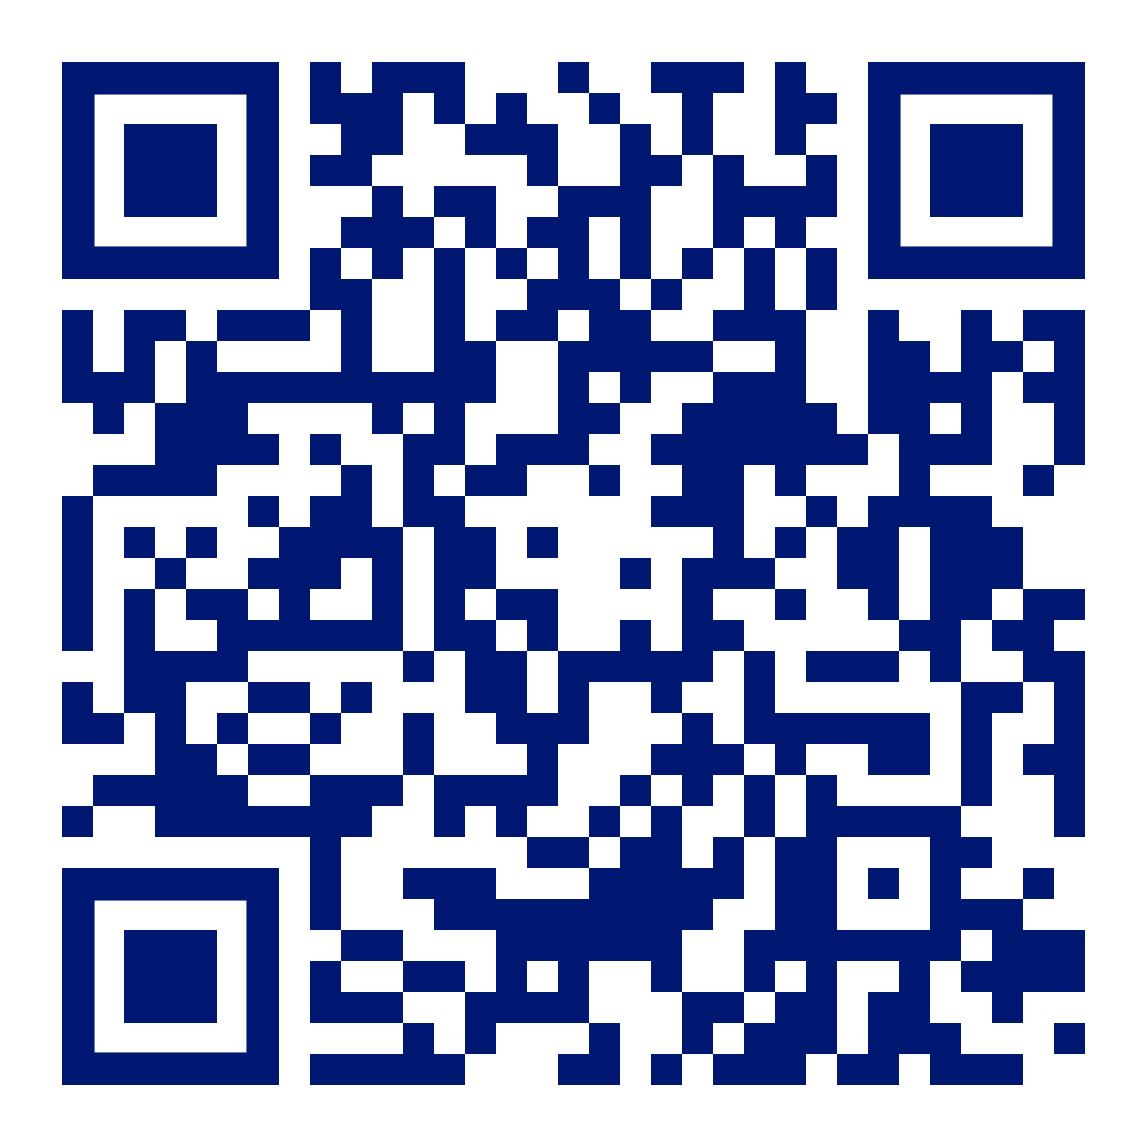 qr-code David Kelly (blue)